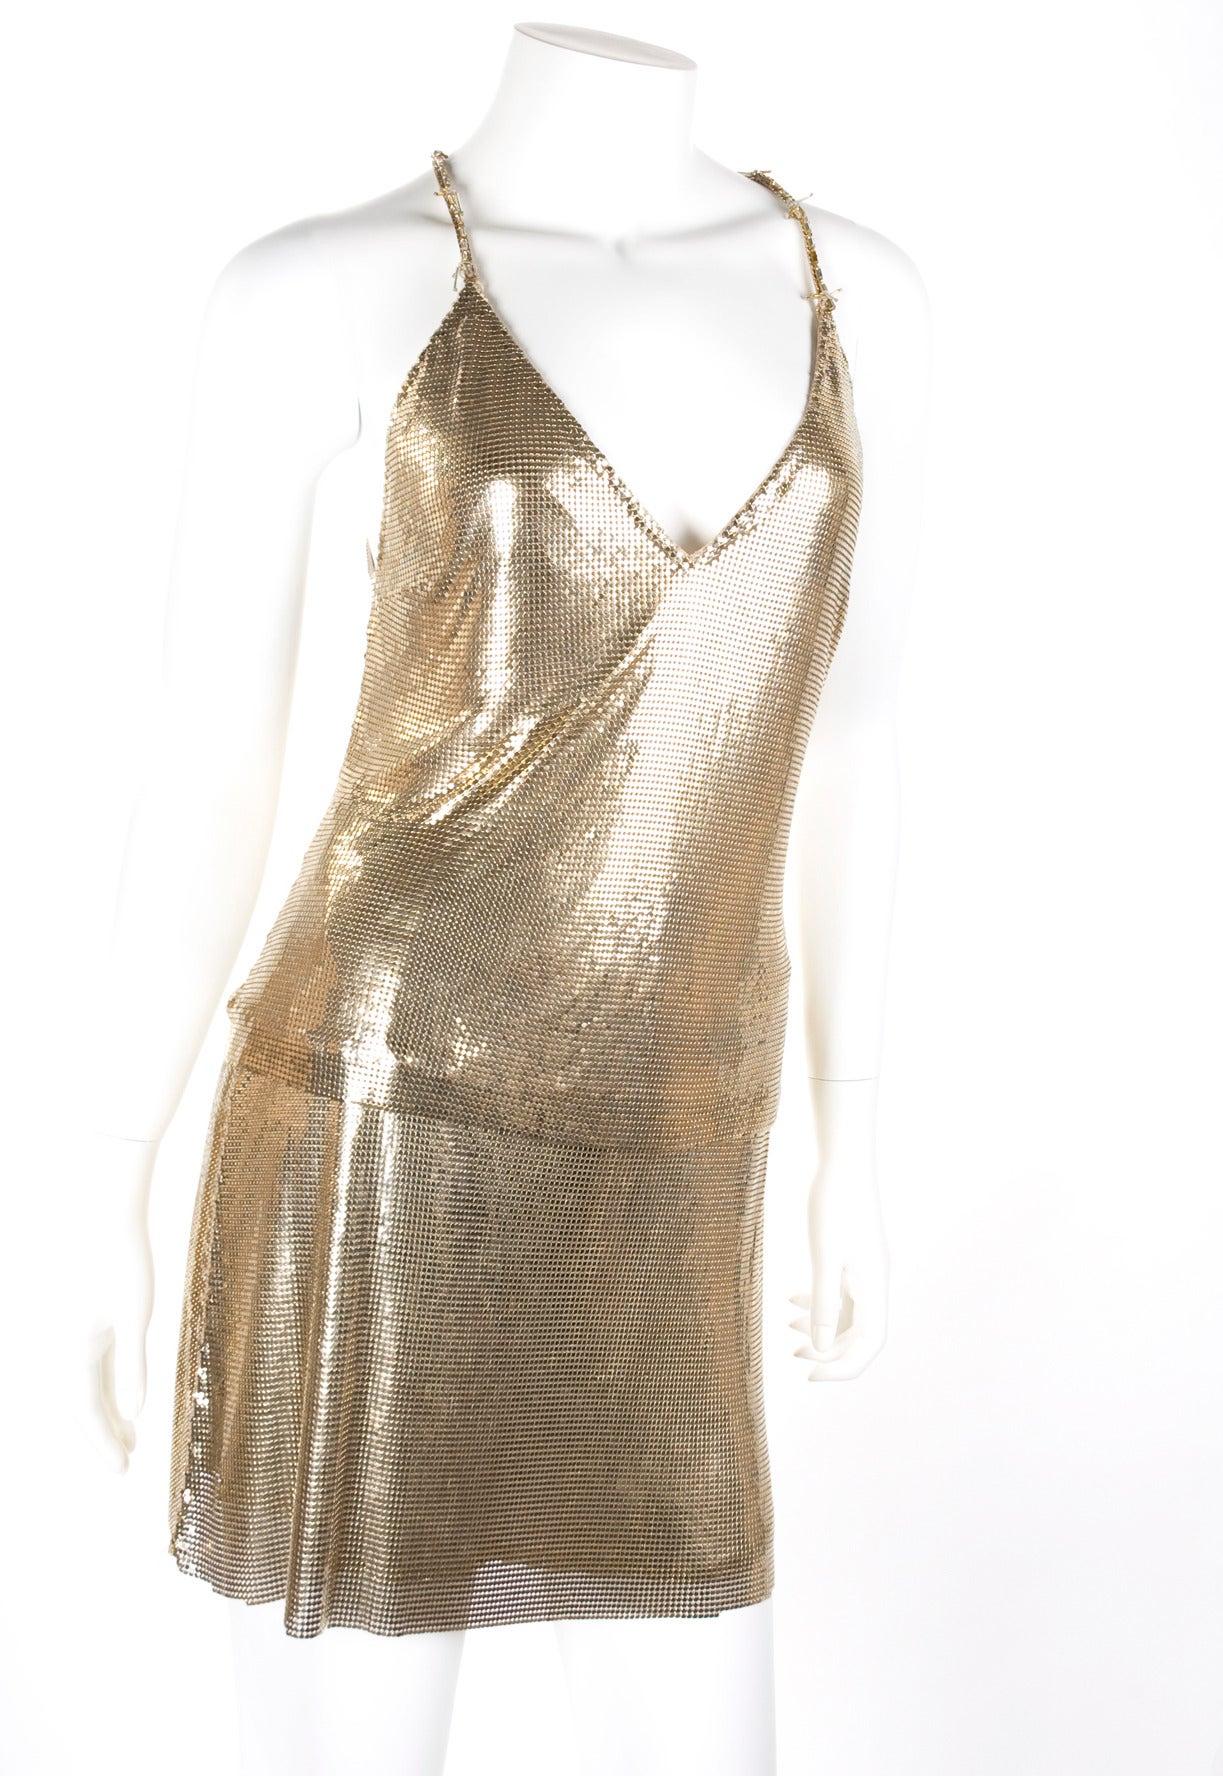 1982 Gianni Versace Couture Metal Mesh Oroton Top and Skirt 3